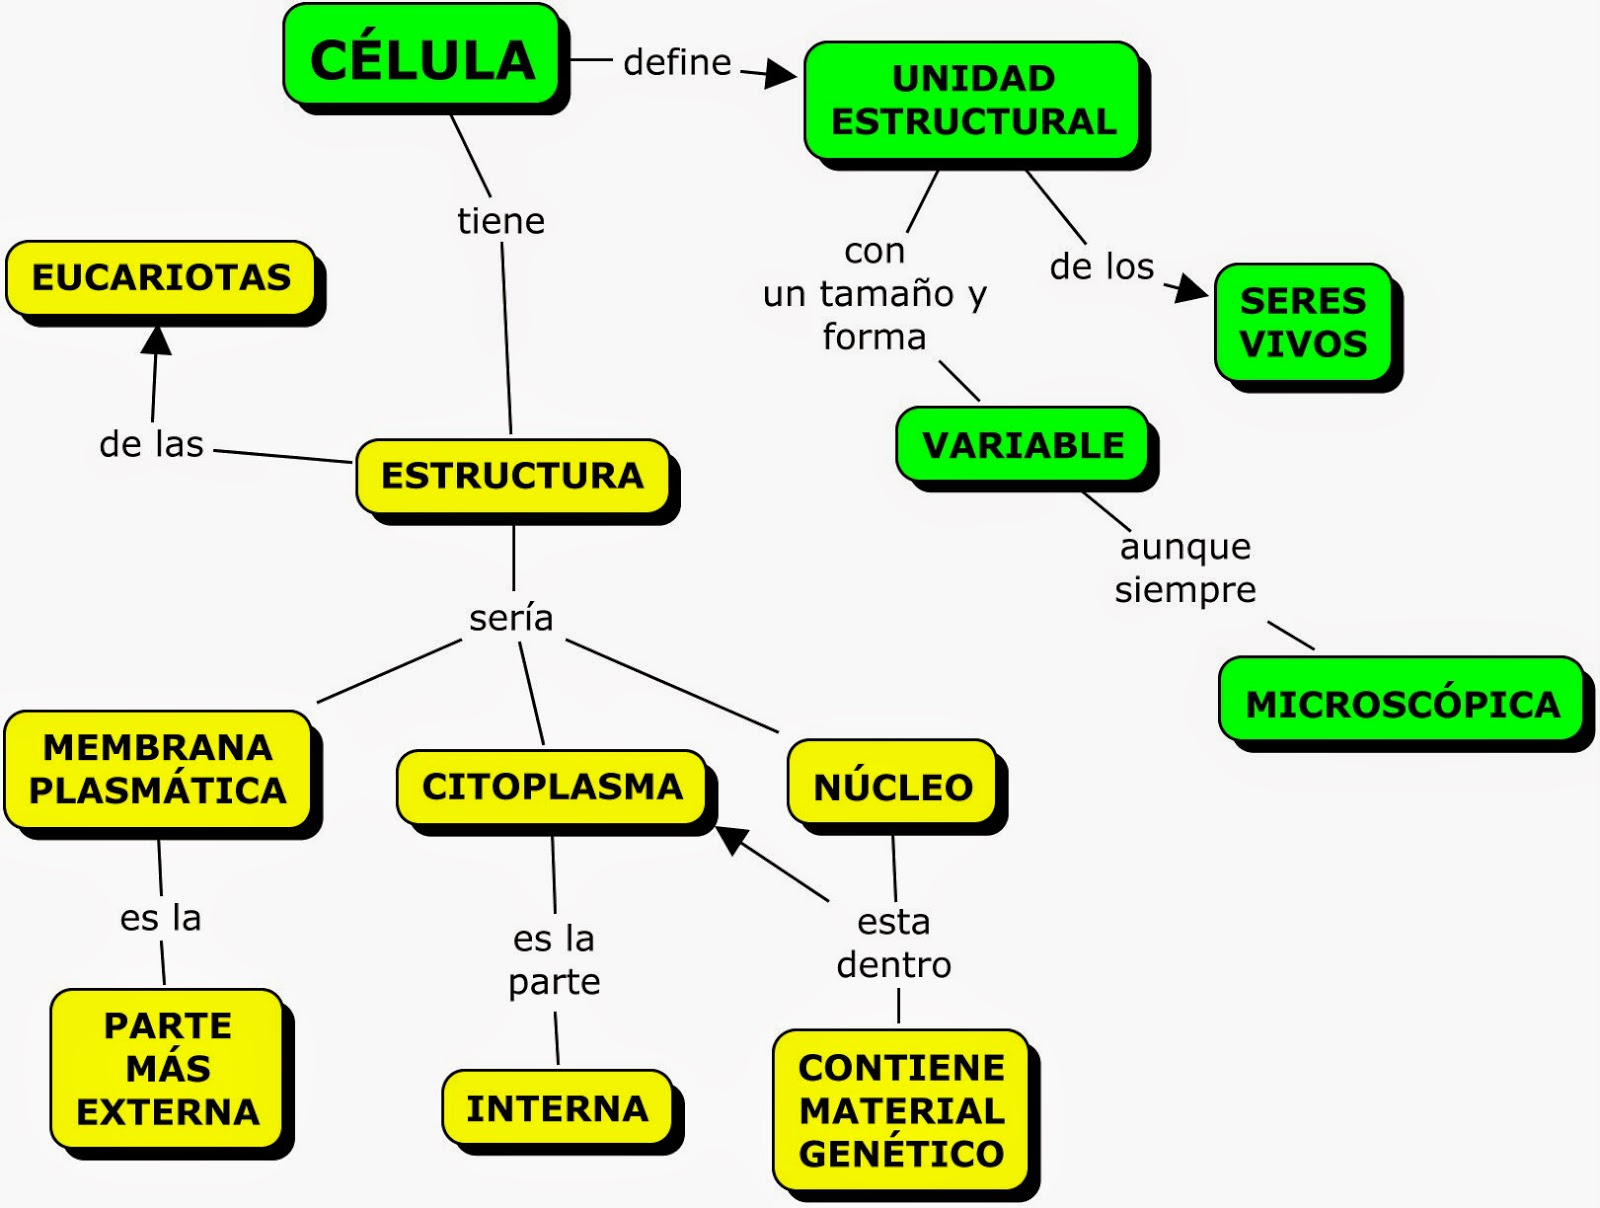 MAPA CONCEPTUAL SOBRE LA CÉLULA | MAPAS CONCEPTUALES (MIND MAPS) y ...